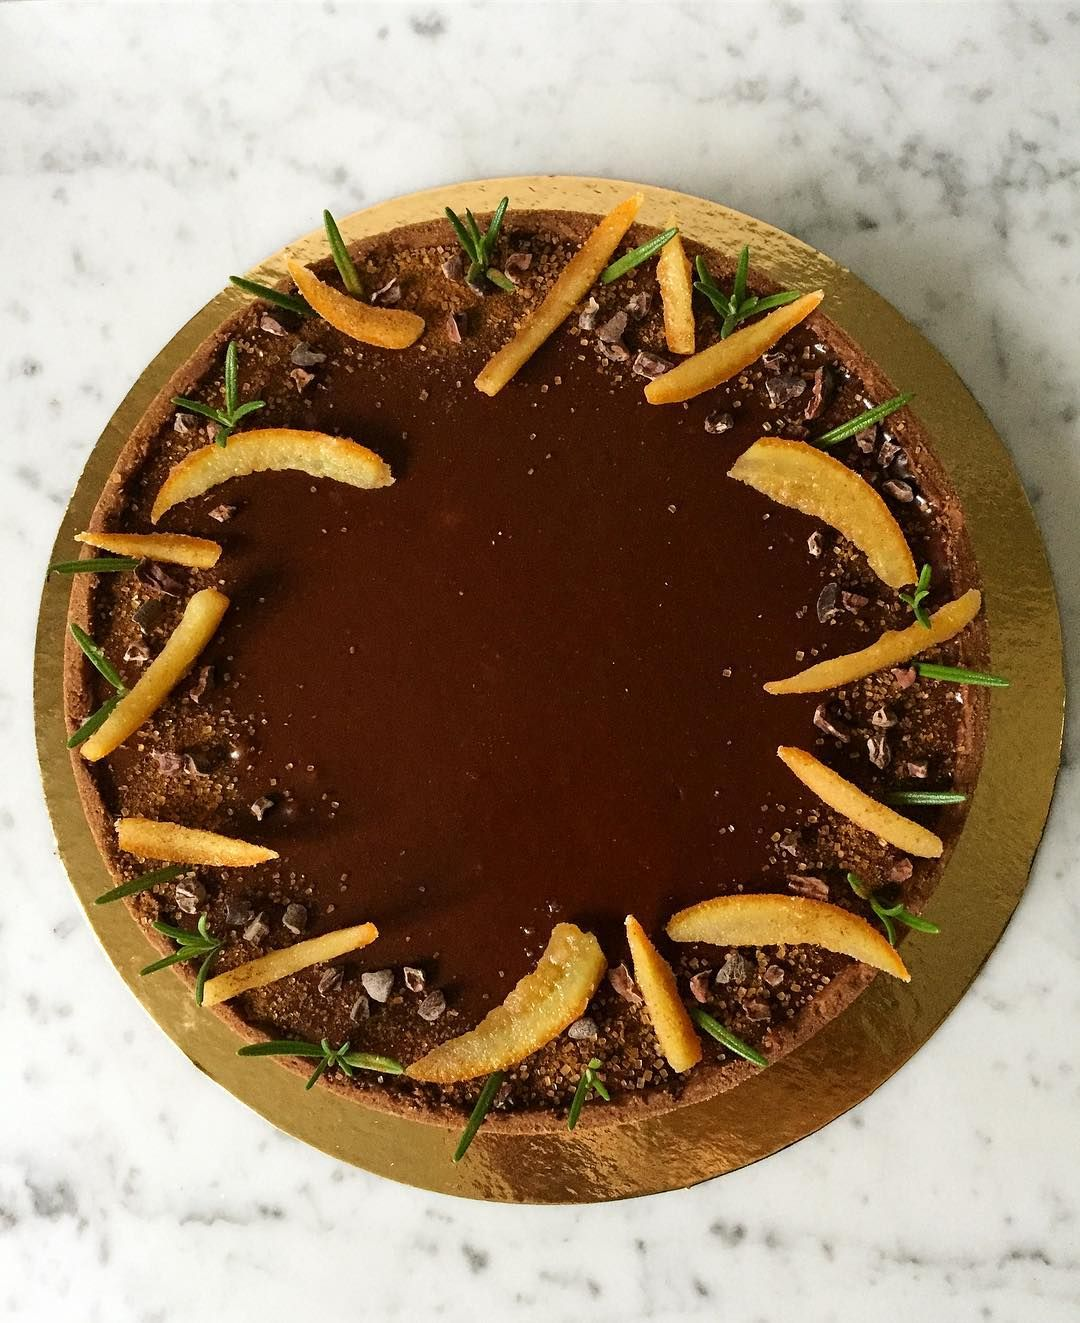 Gluten free chocolate orange cake with images gluten